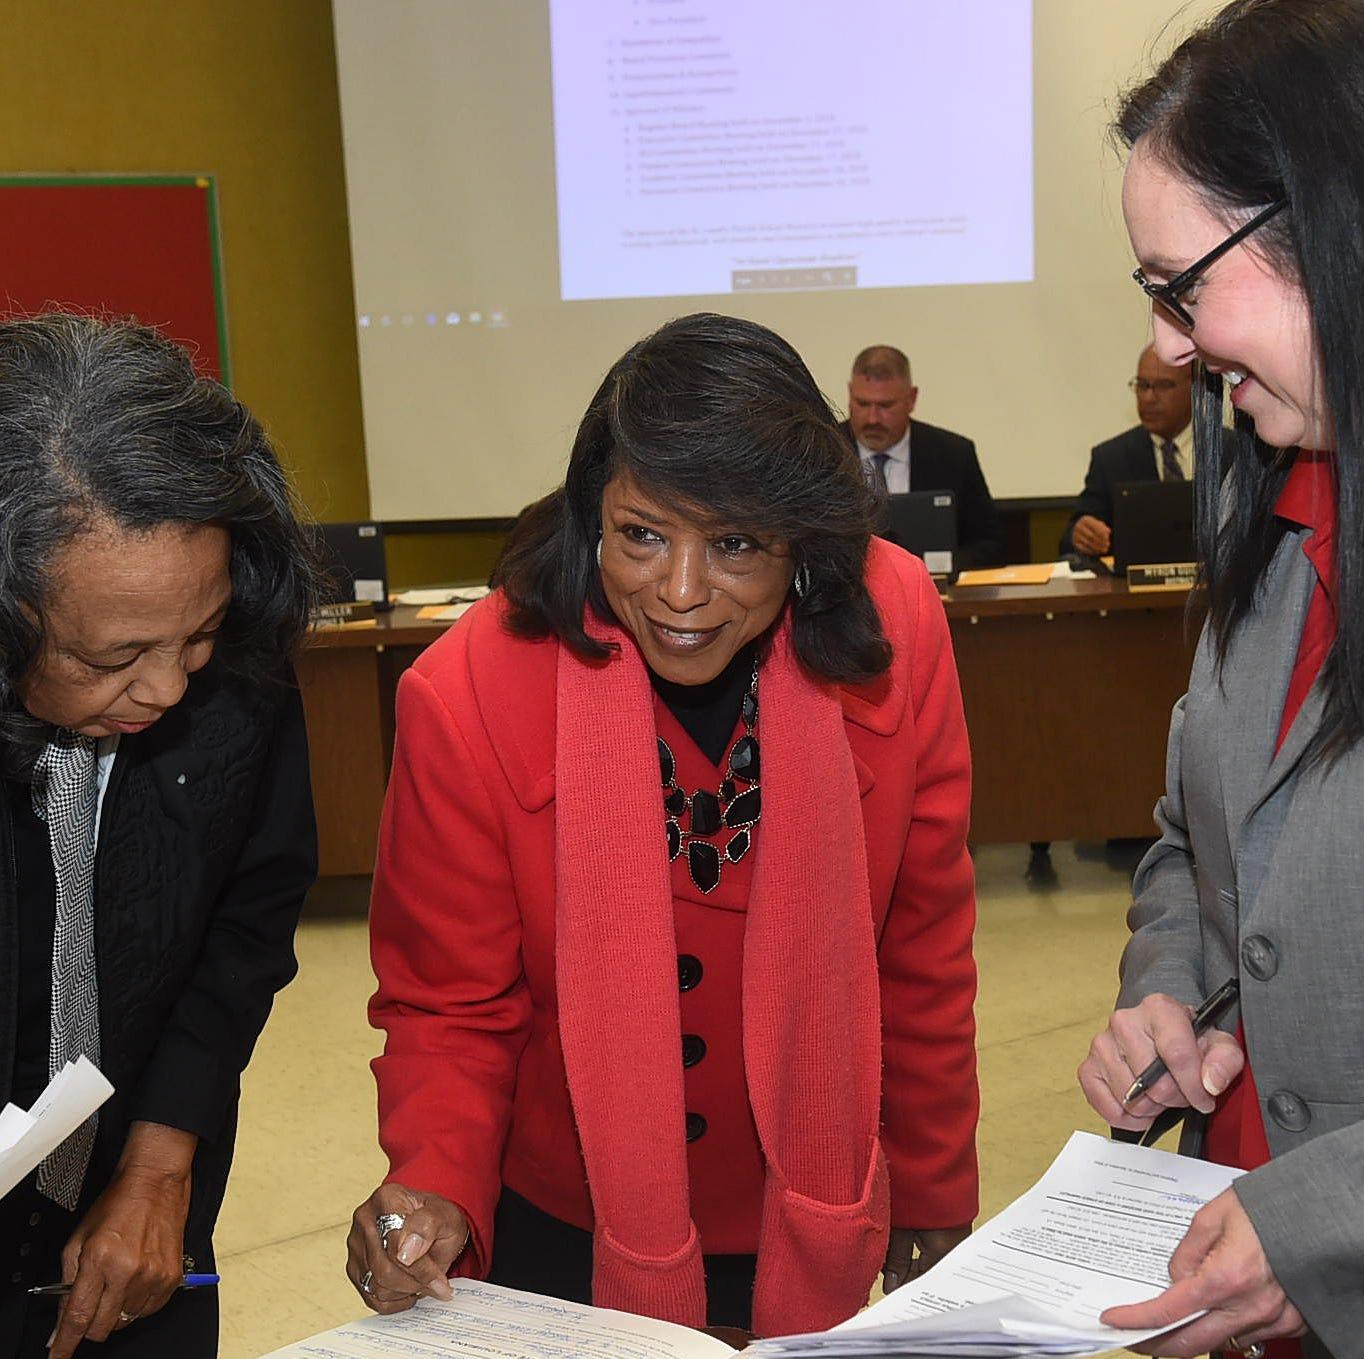 New school board president talks strategy for improvement